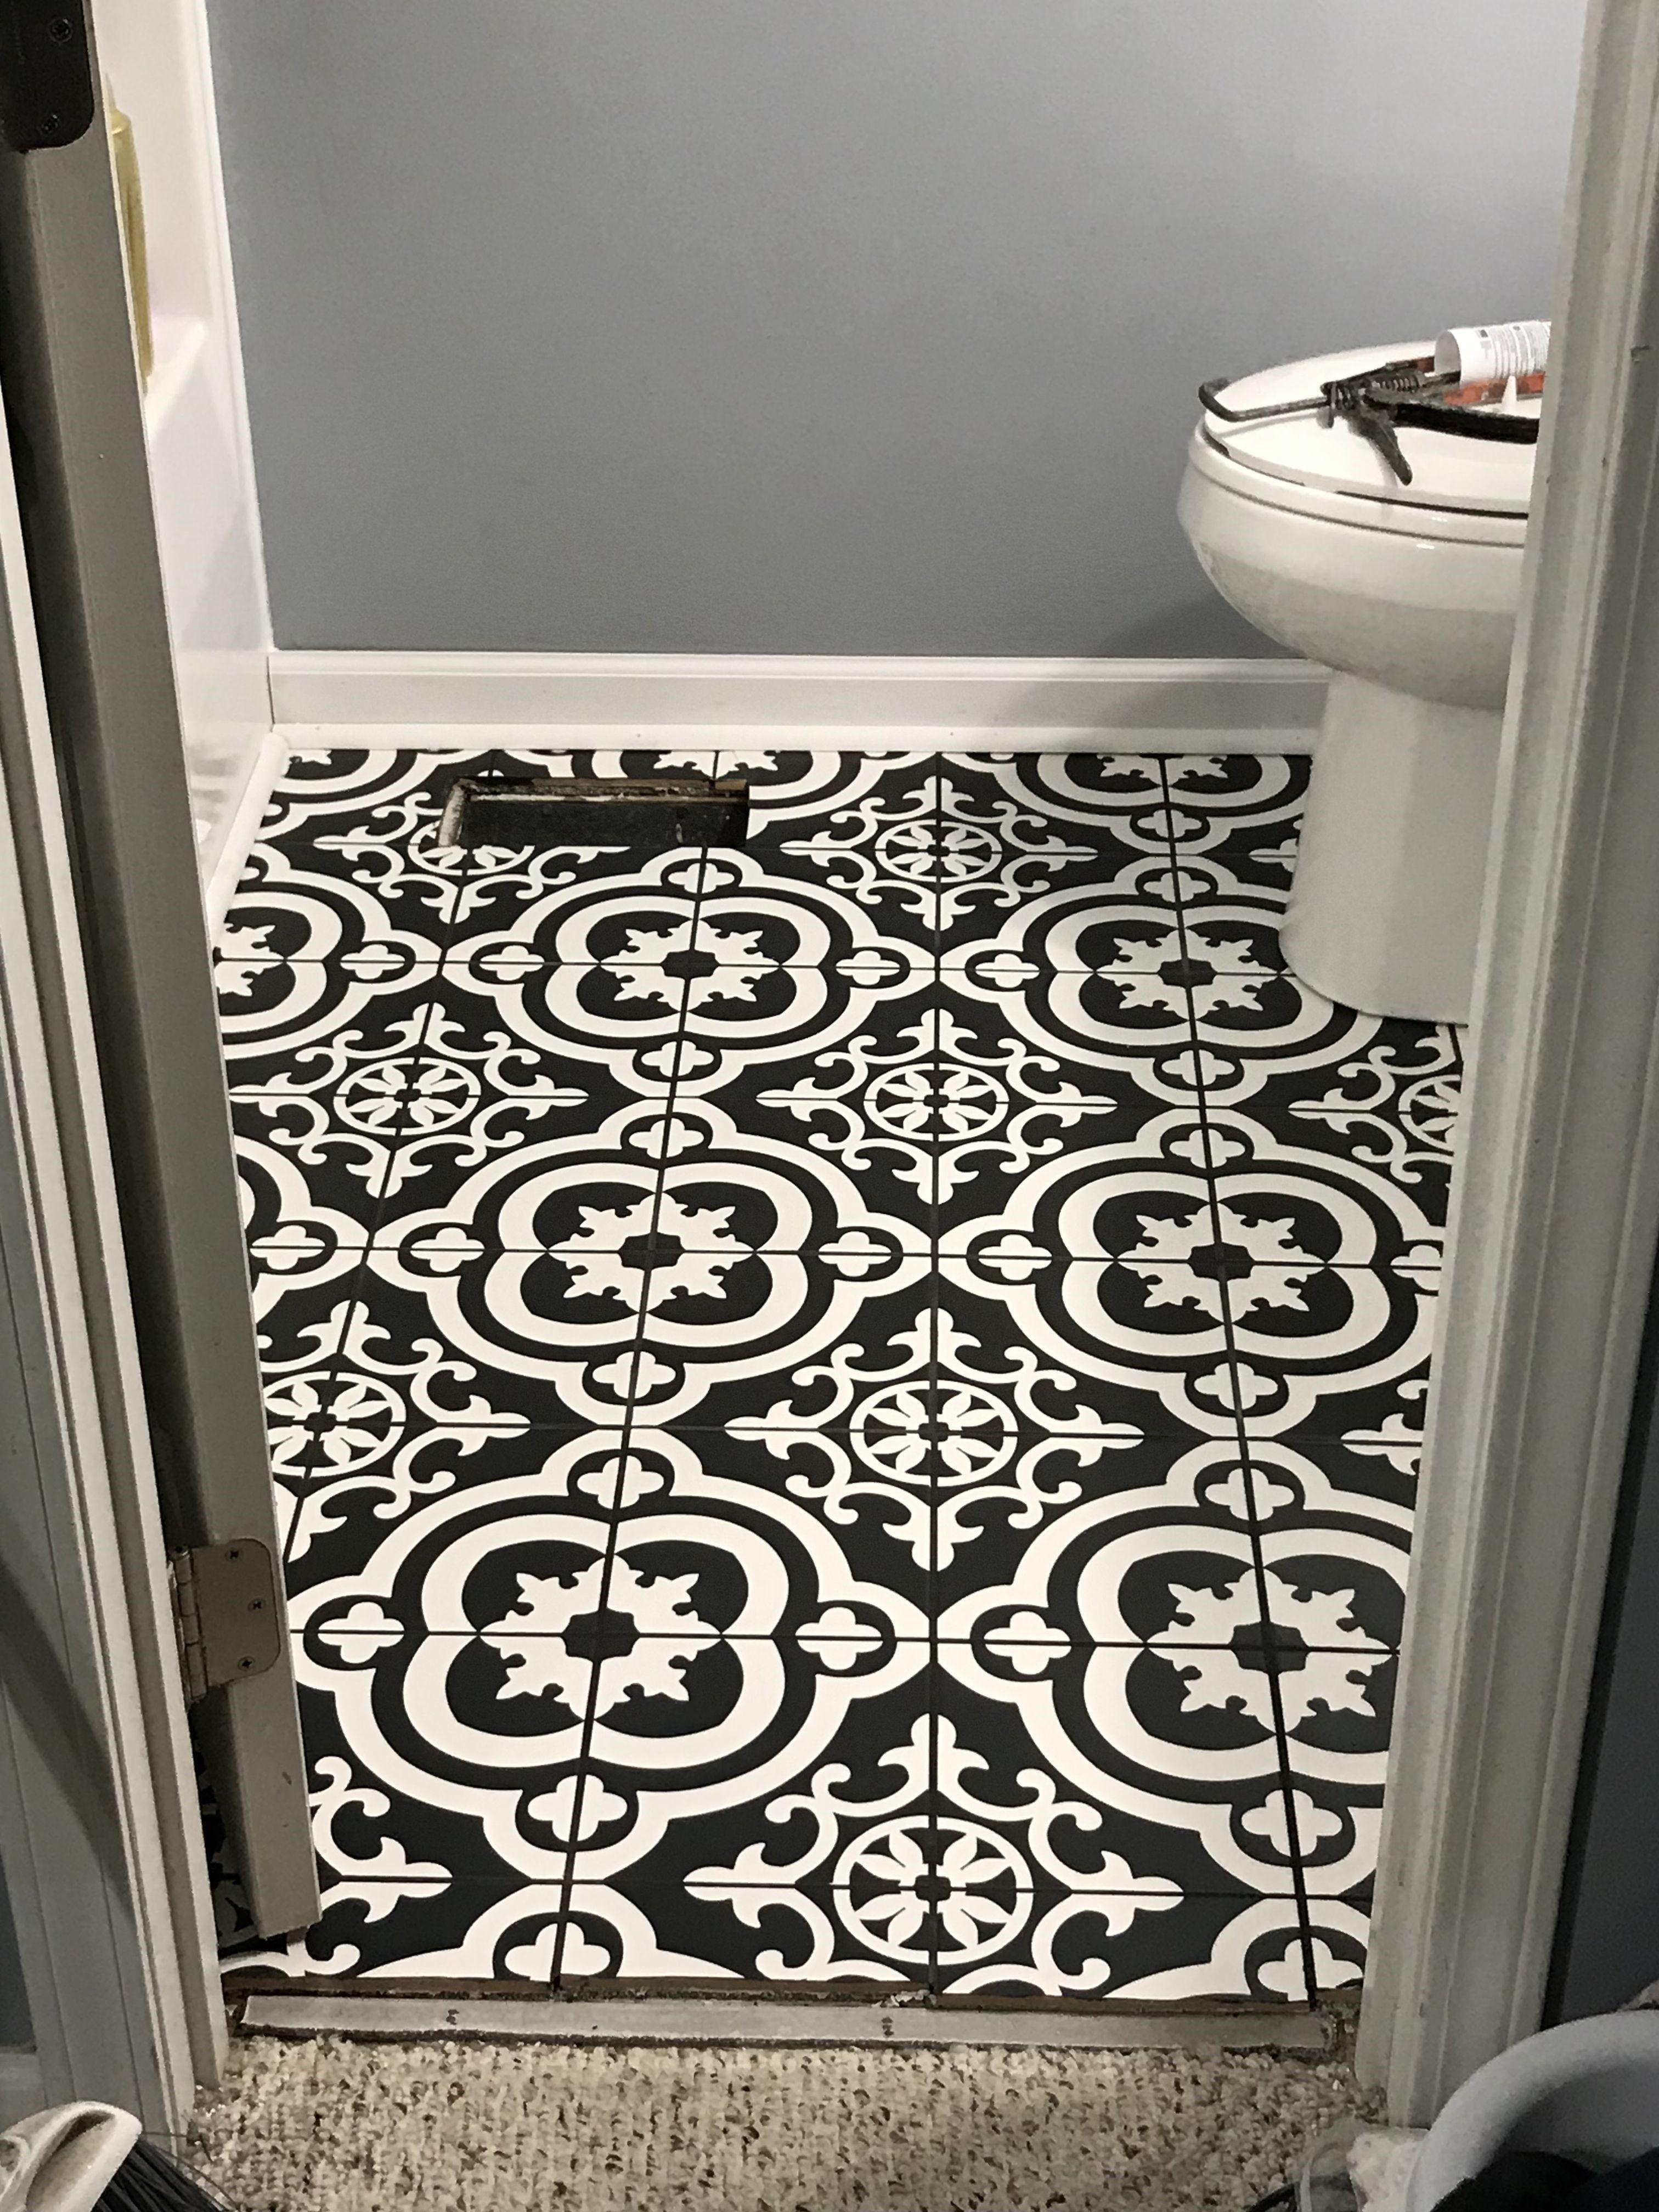 25 Vintage Bathroom Tile Patterns Pelaburemasperak Com In 2020 Vintage Bathroom Tile Black And White Bathroom Floor Patterned Bathroom Tiles